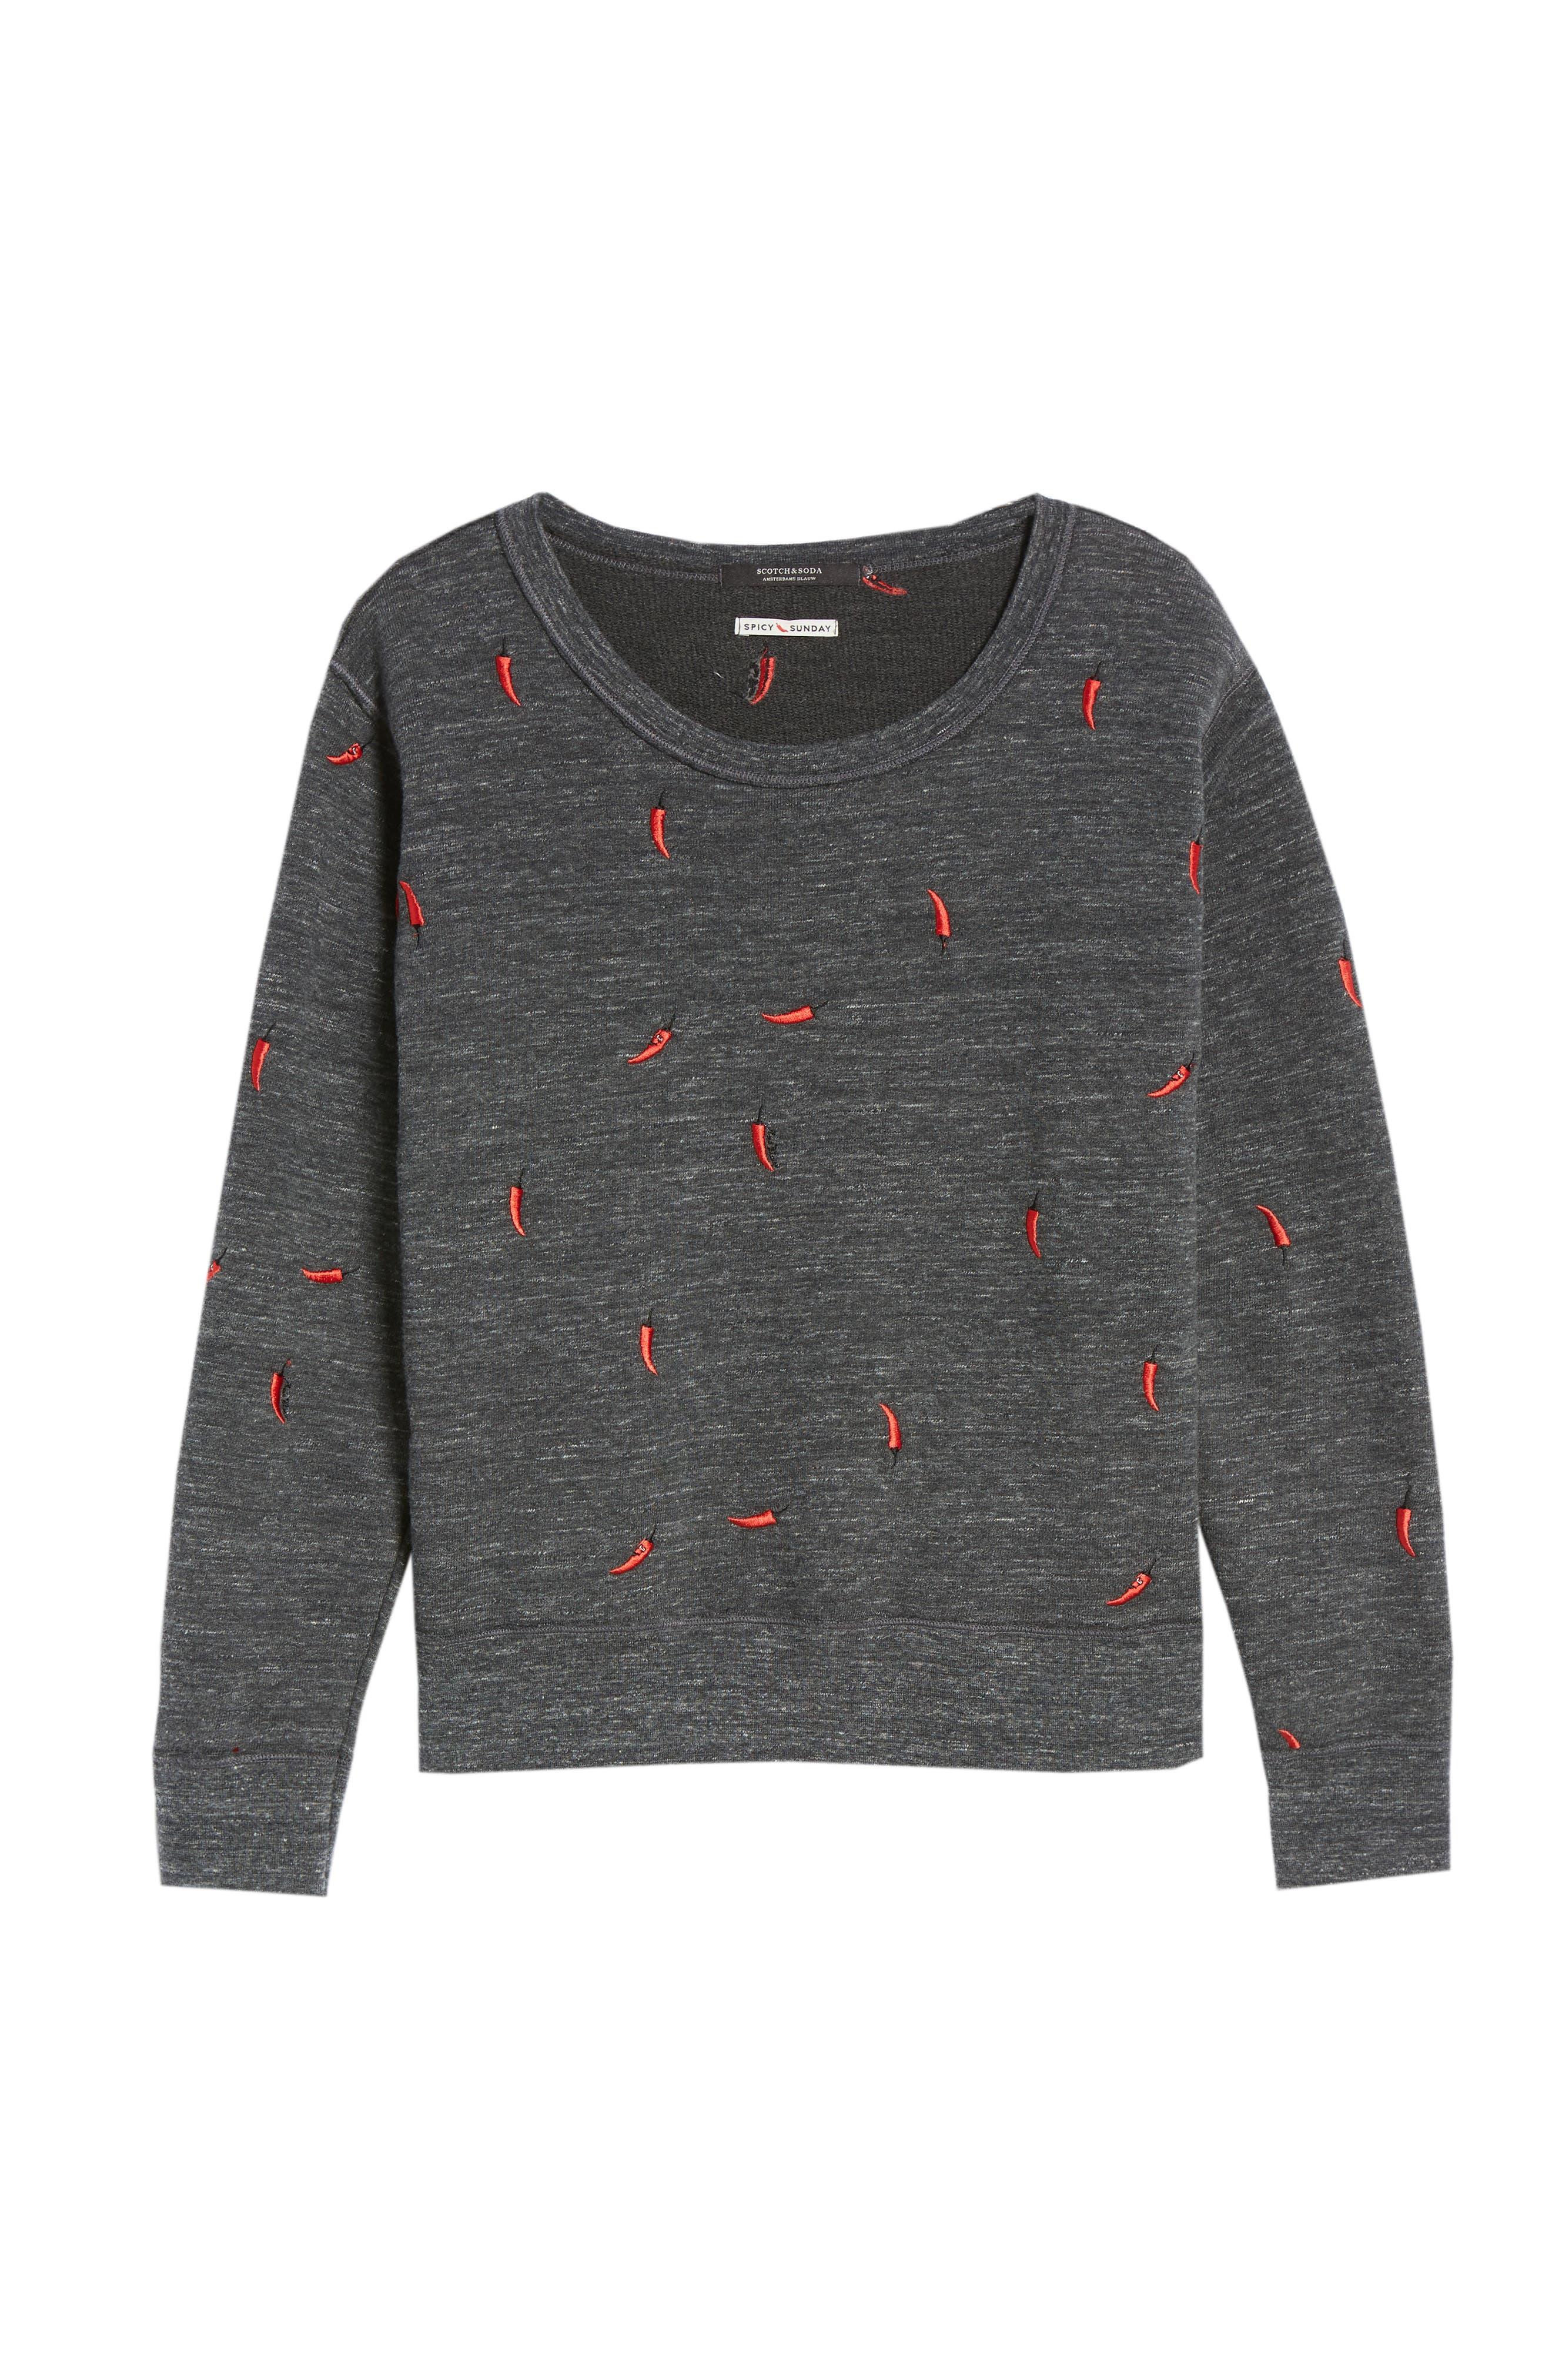 Chili Pepper Crewneck Sweatshirt,                             Alternate thumbnail 6, color,                             021